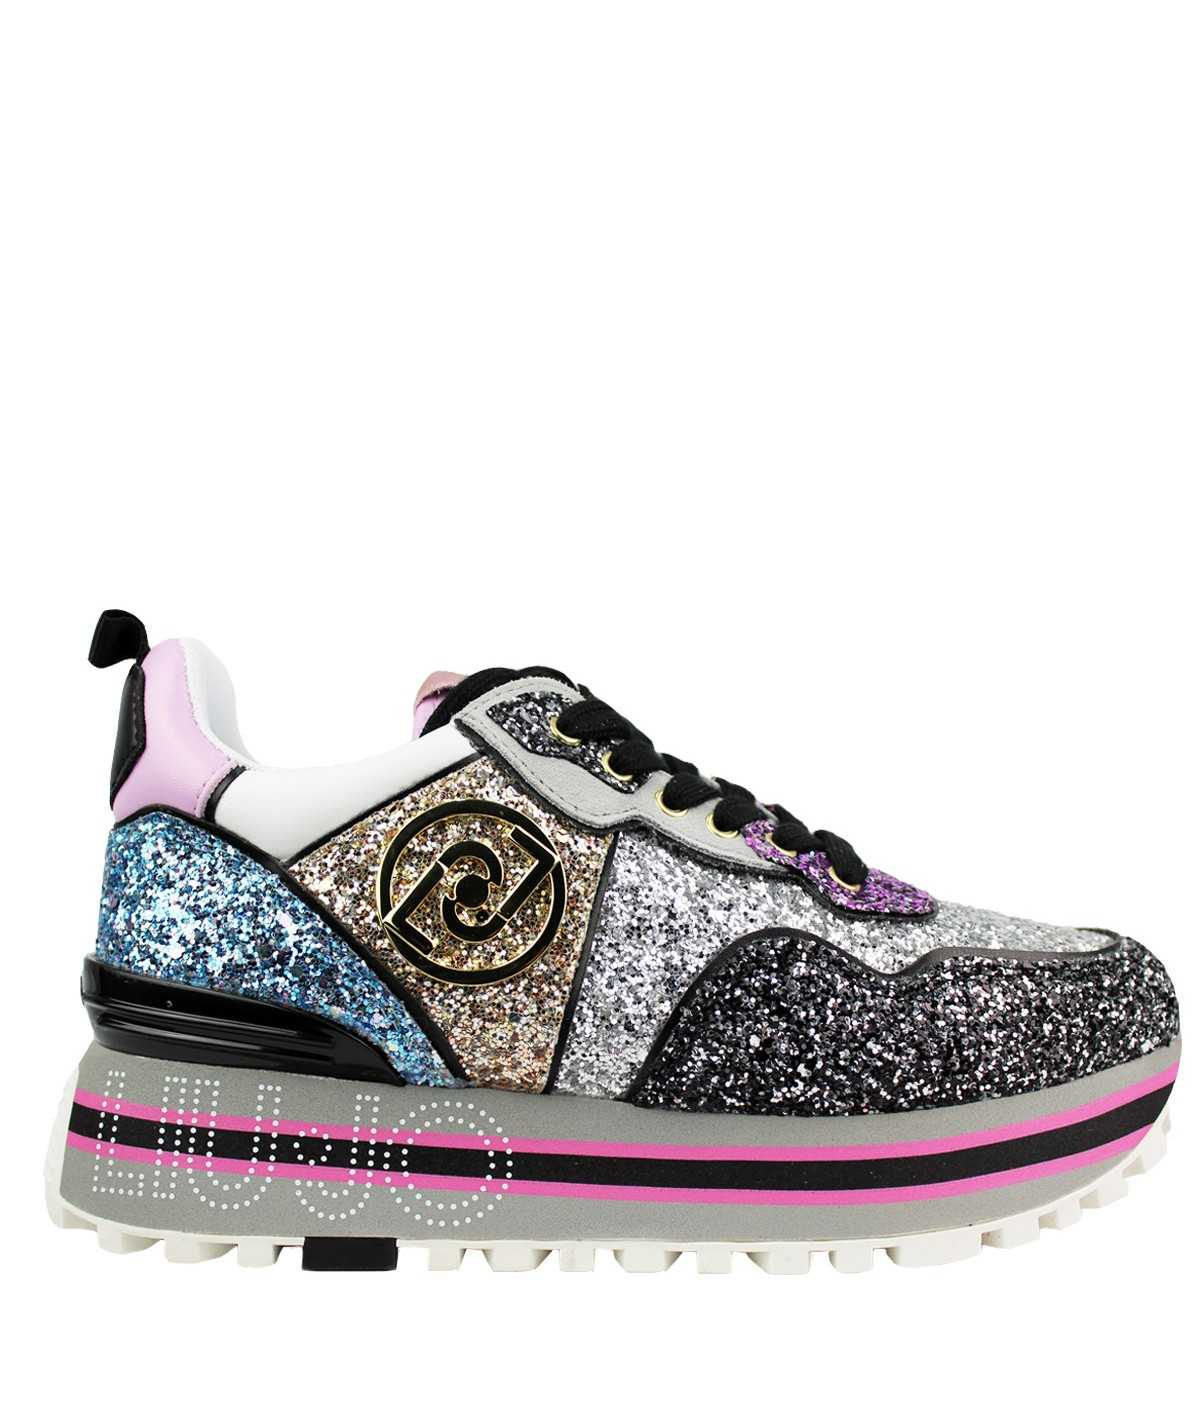 LIU JO Sneakers con glitter